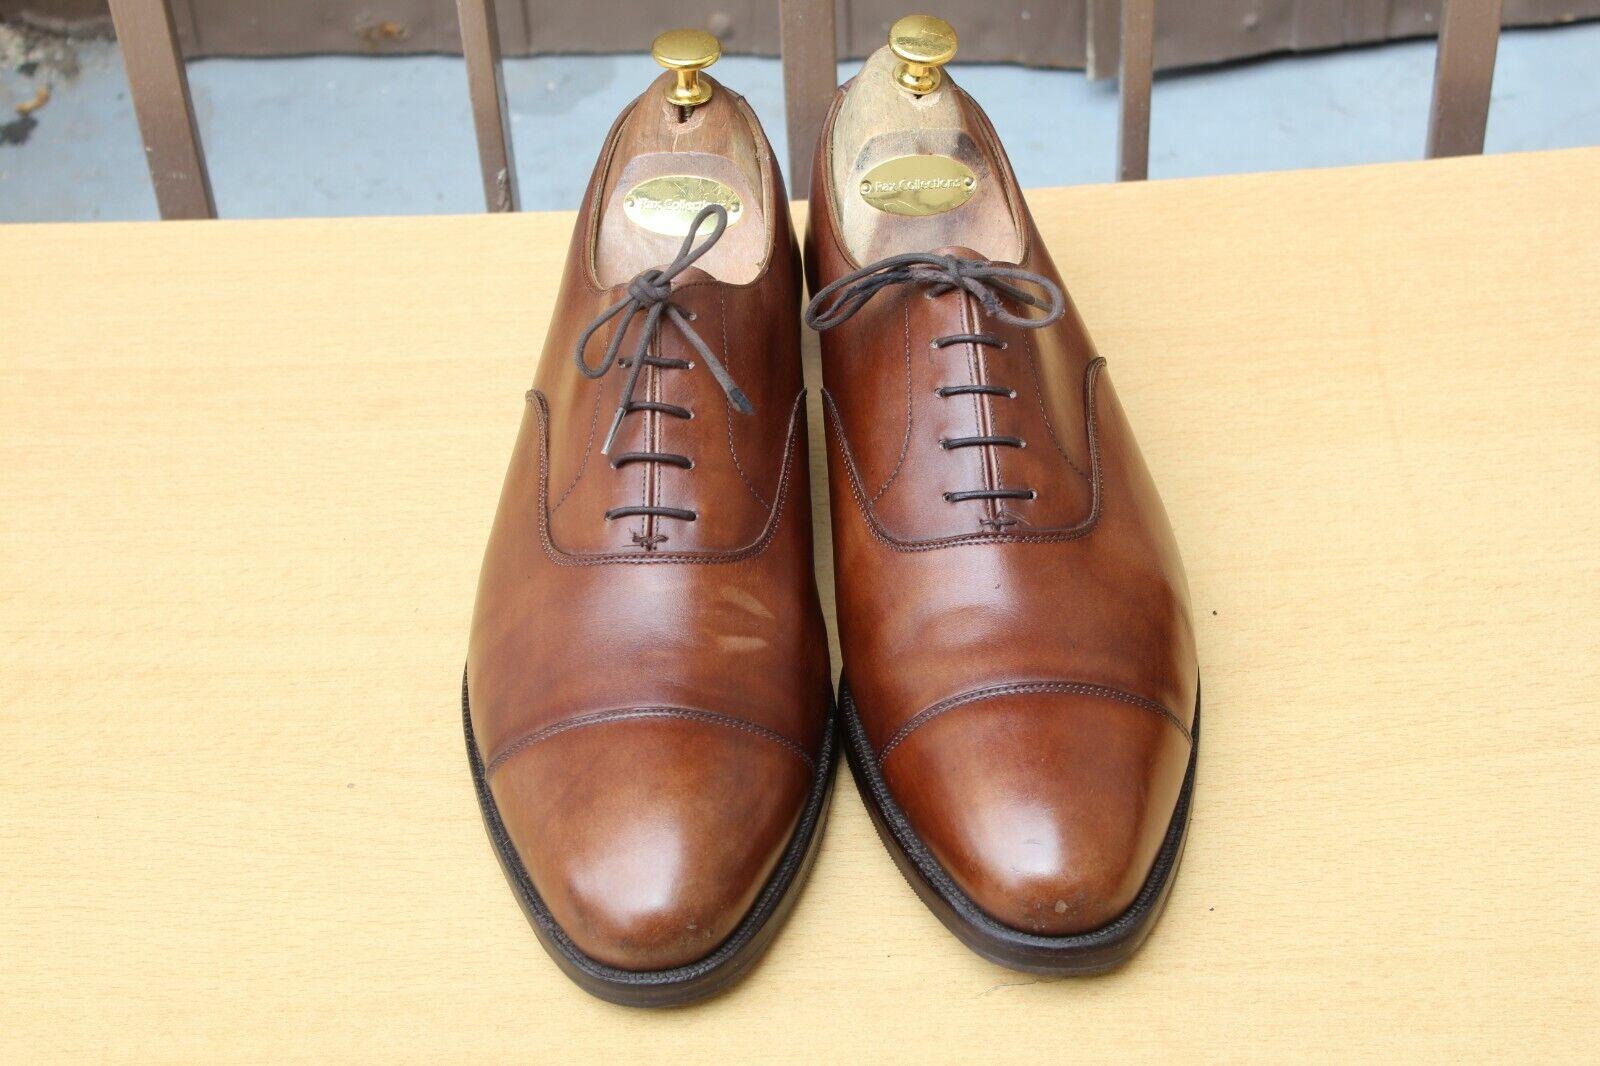 CHAUSSURE CROCKETT&JONES  CONNAUGHT  CUIR 11 EE 45 TRES BON ETAT hombres zapatos